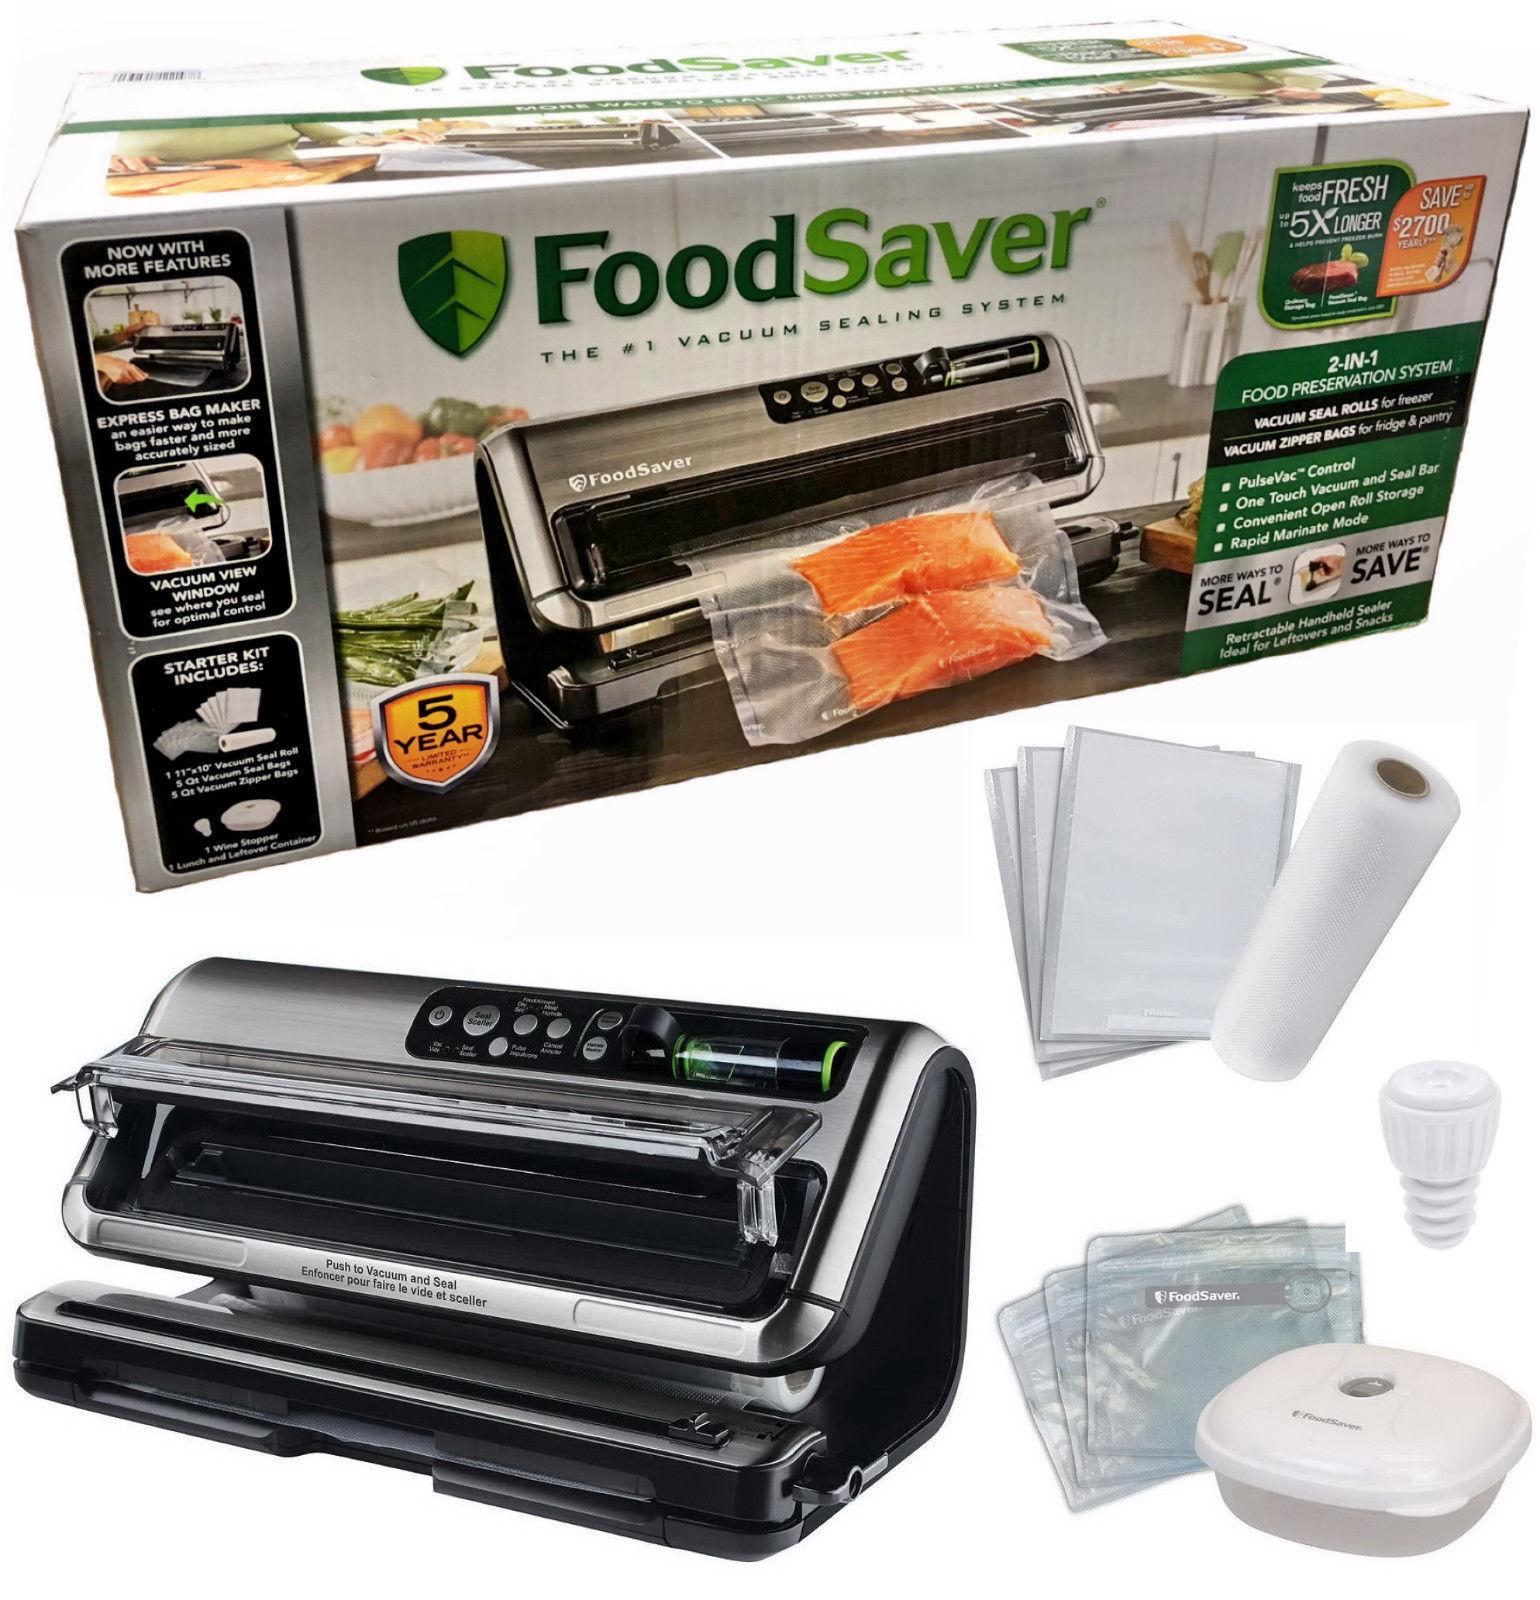 FoodSaver 5400 série 1 en 2-scelleuse sous vide Set avec Express Sac Maker Starter Kit